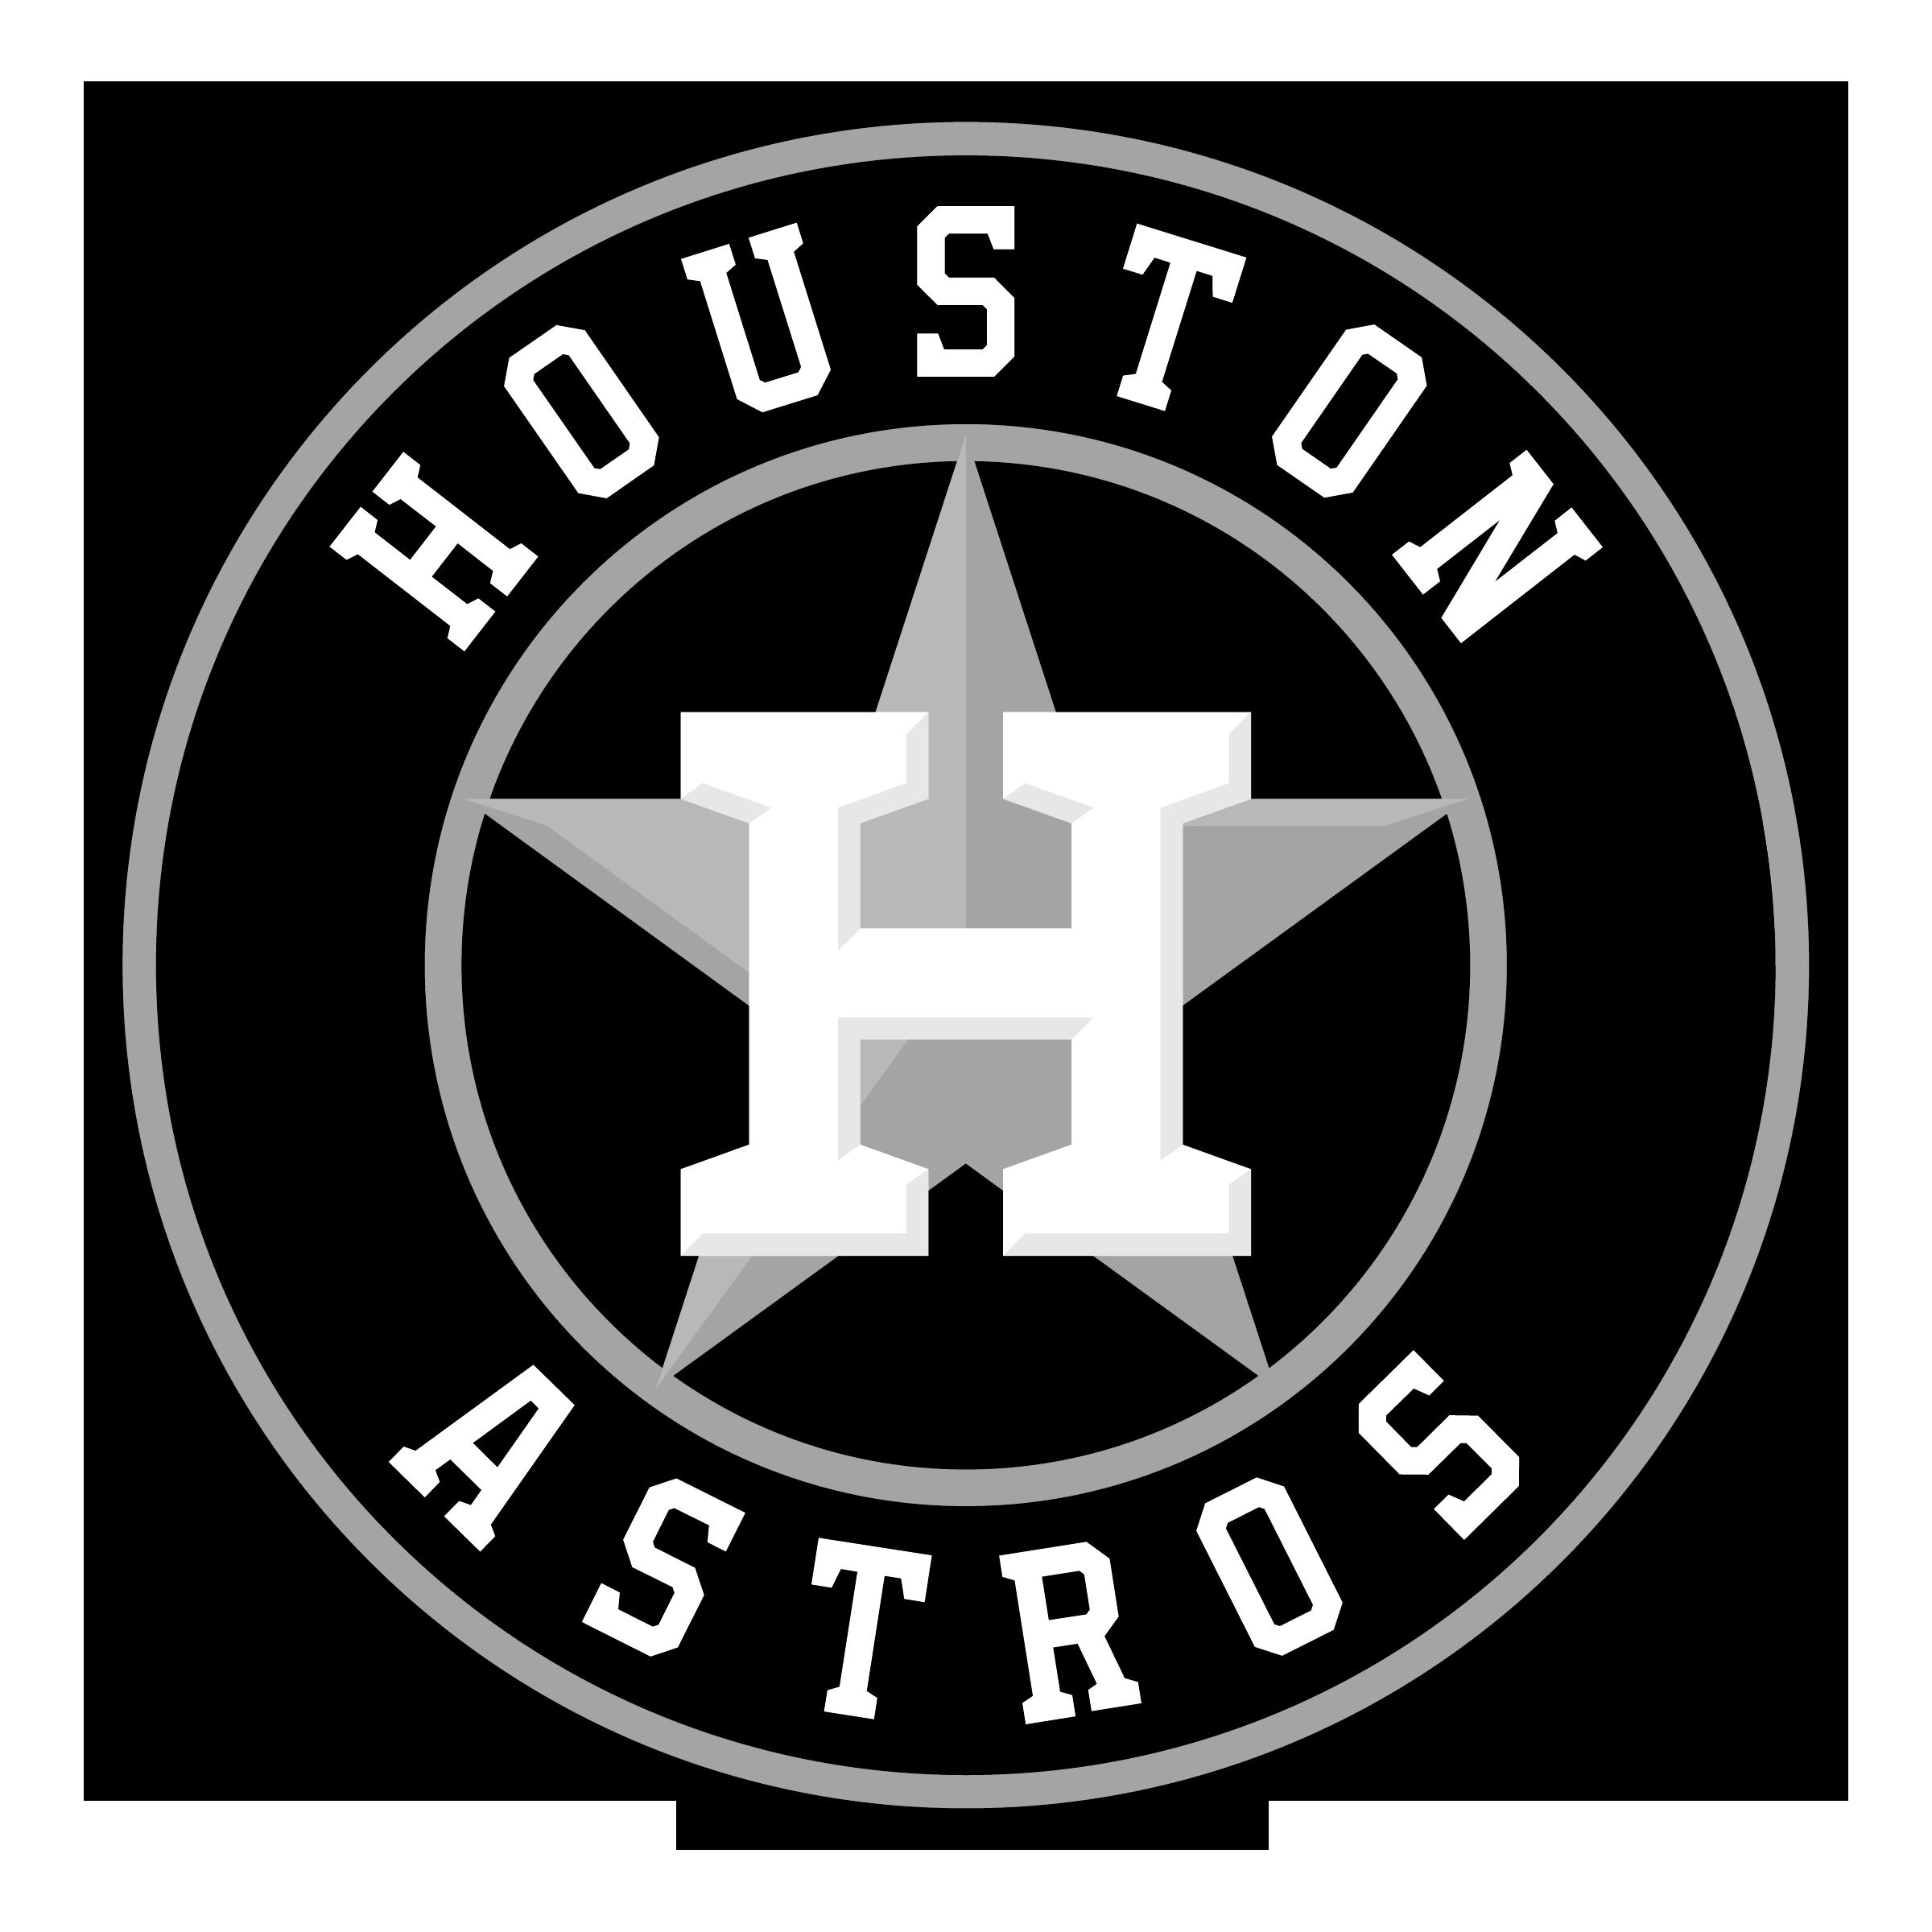 Houston Astros Logo PNG Transparent & SVG Vector.